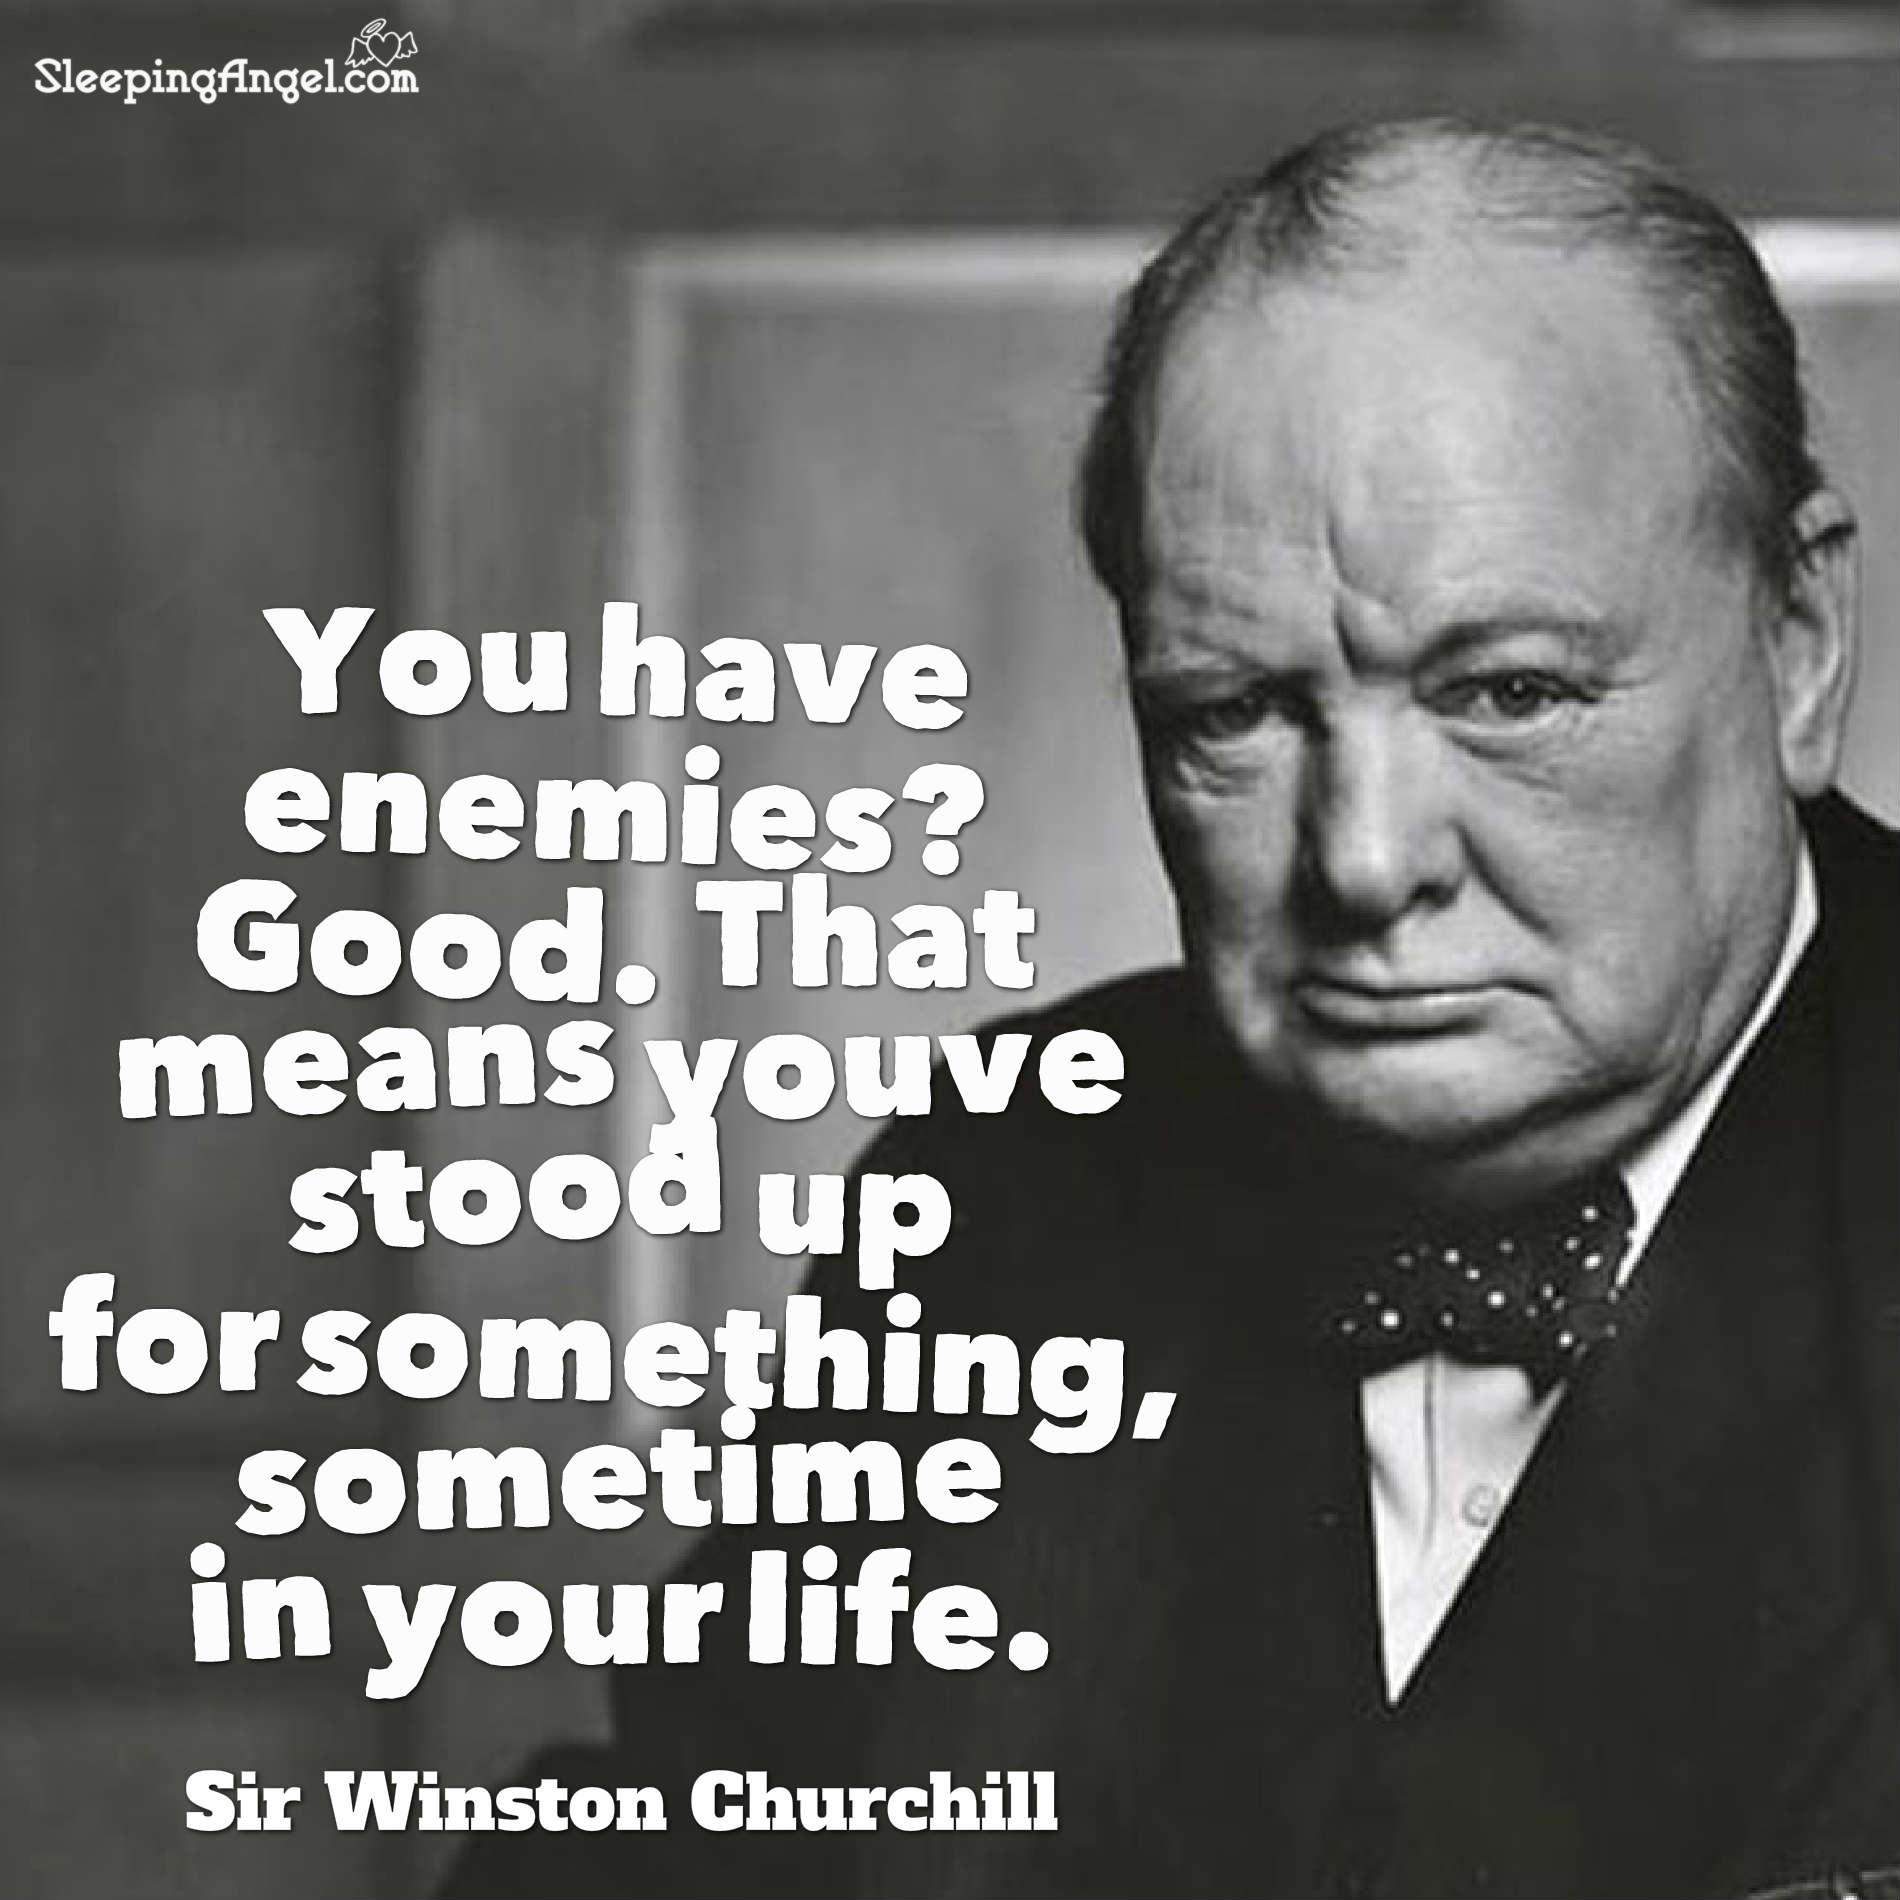 Sir Winston Churchill Quote